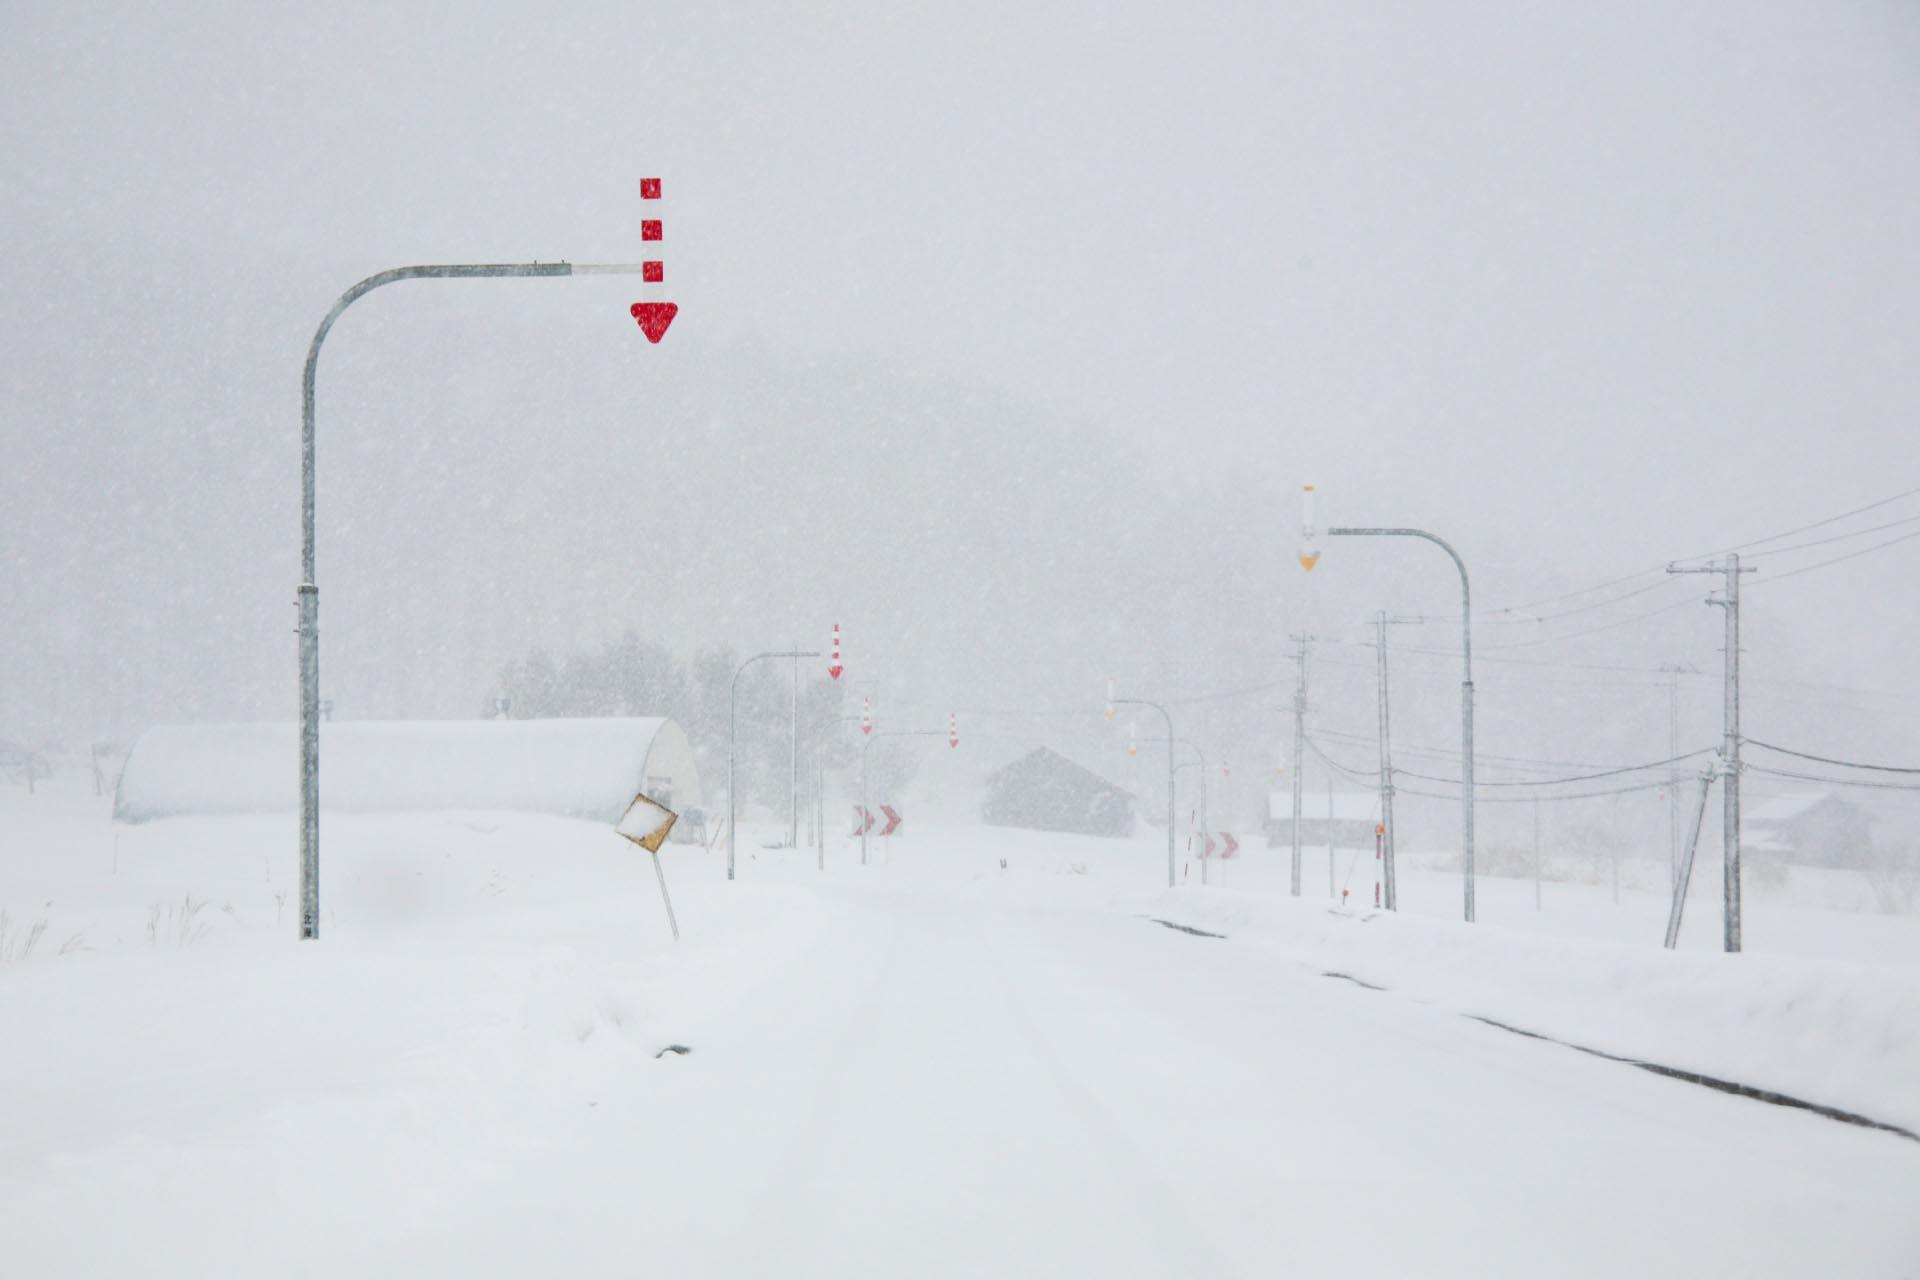 北海道の冬の風景 三月の国道452号線 三笠市~芦別市